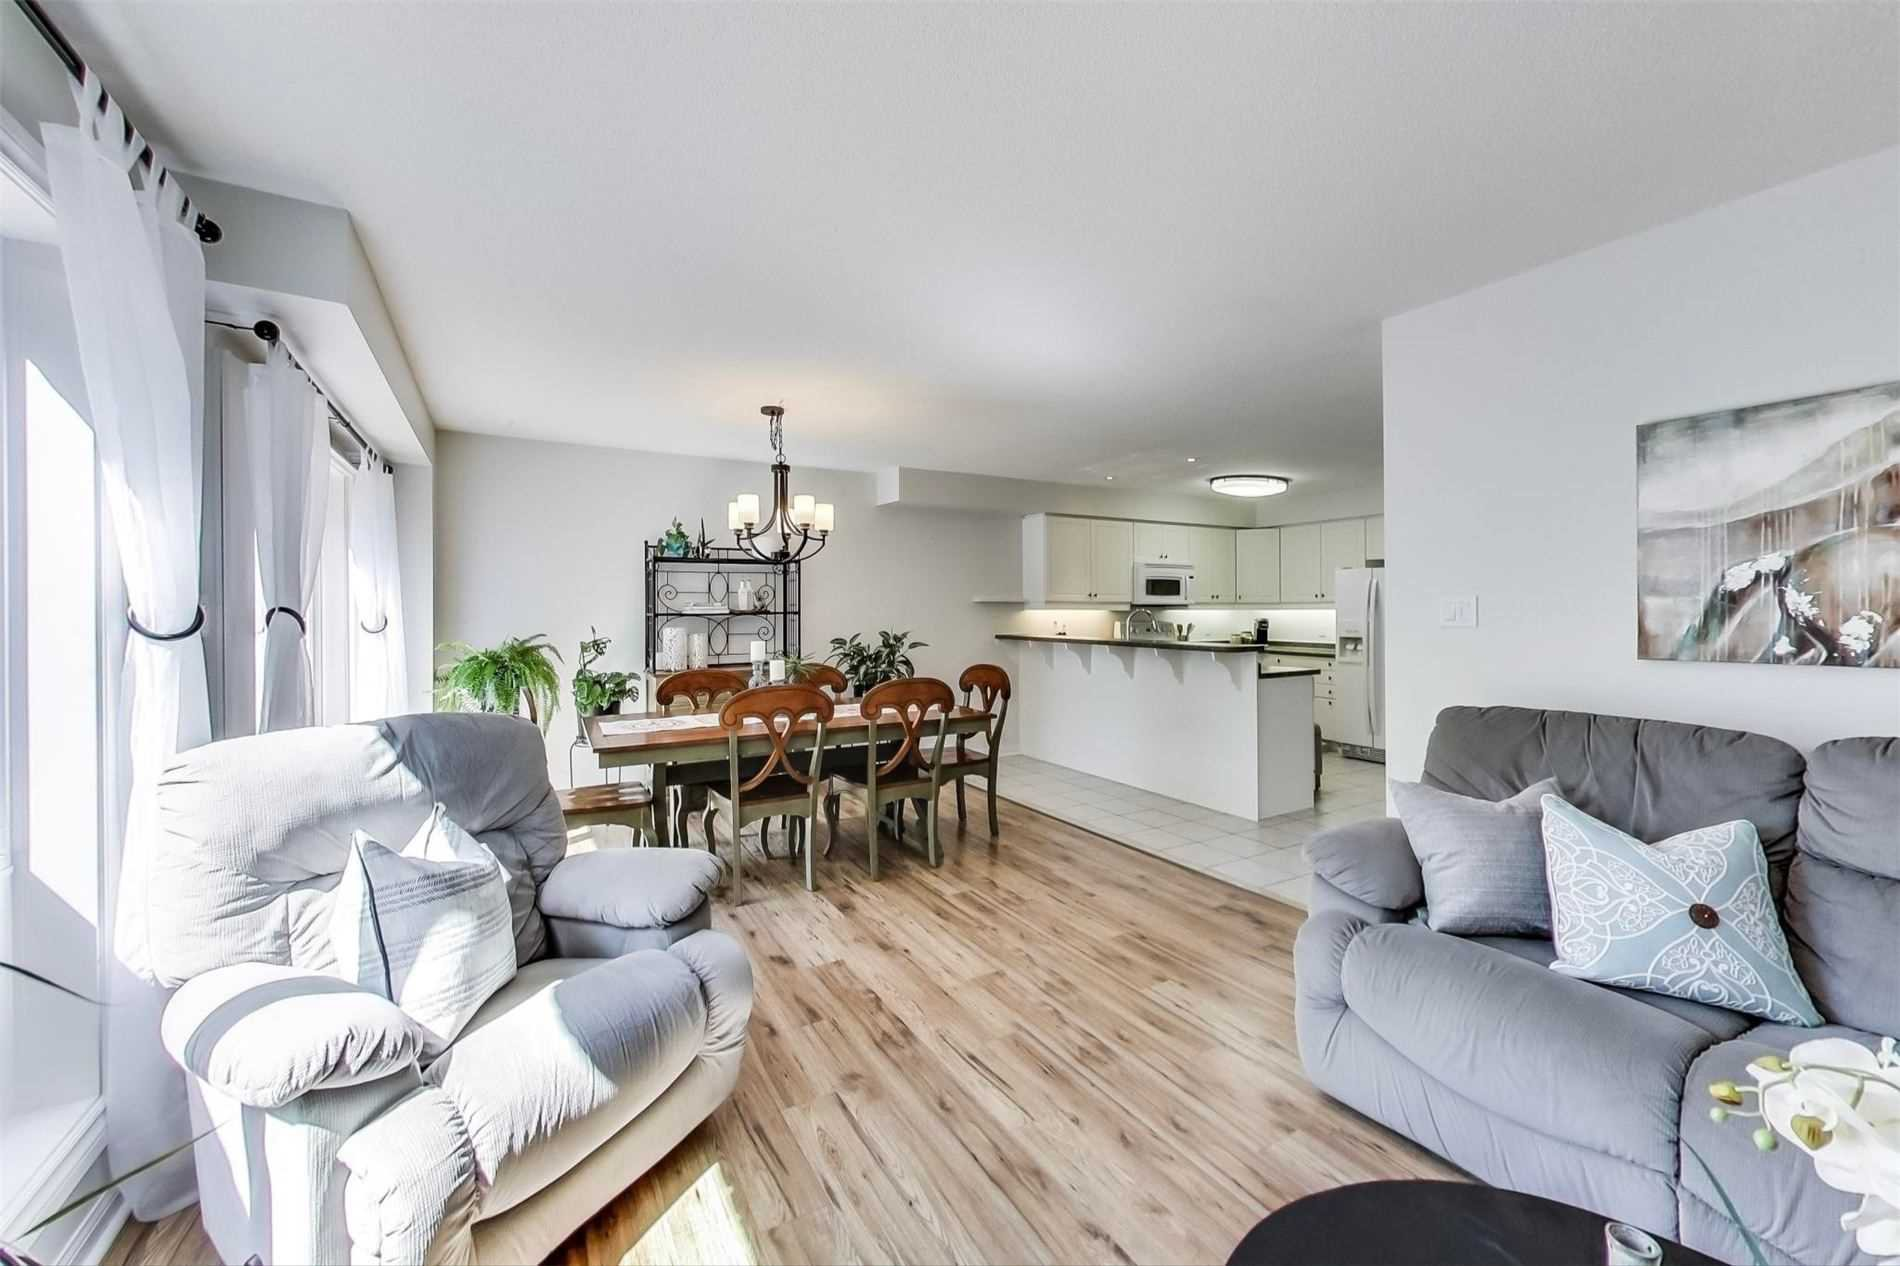 Photo 3: Photos: 61 Torr Lane in Ajax: Central Condo for sale : MLS®# E4874930